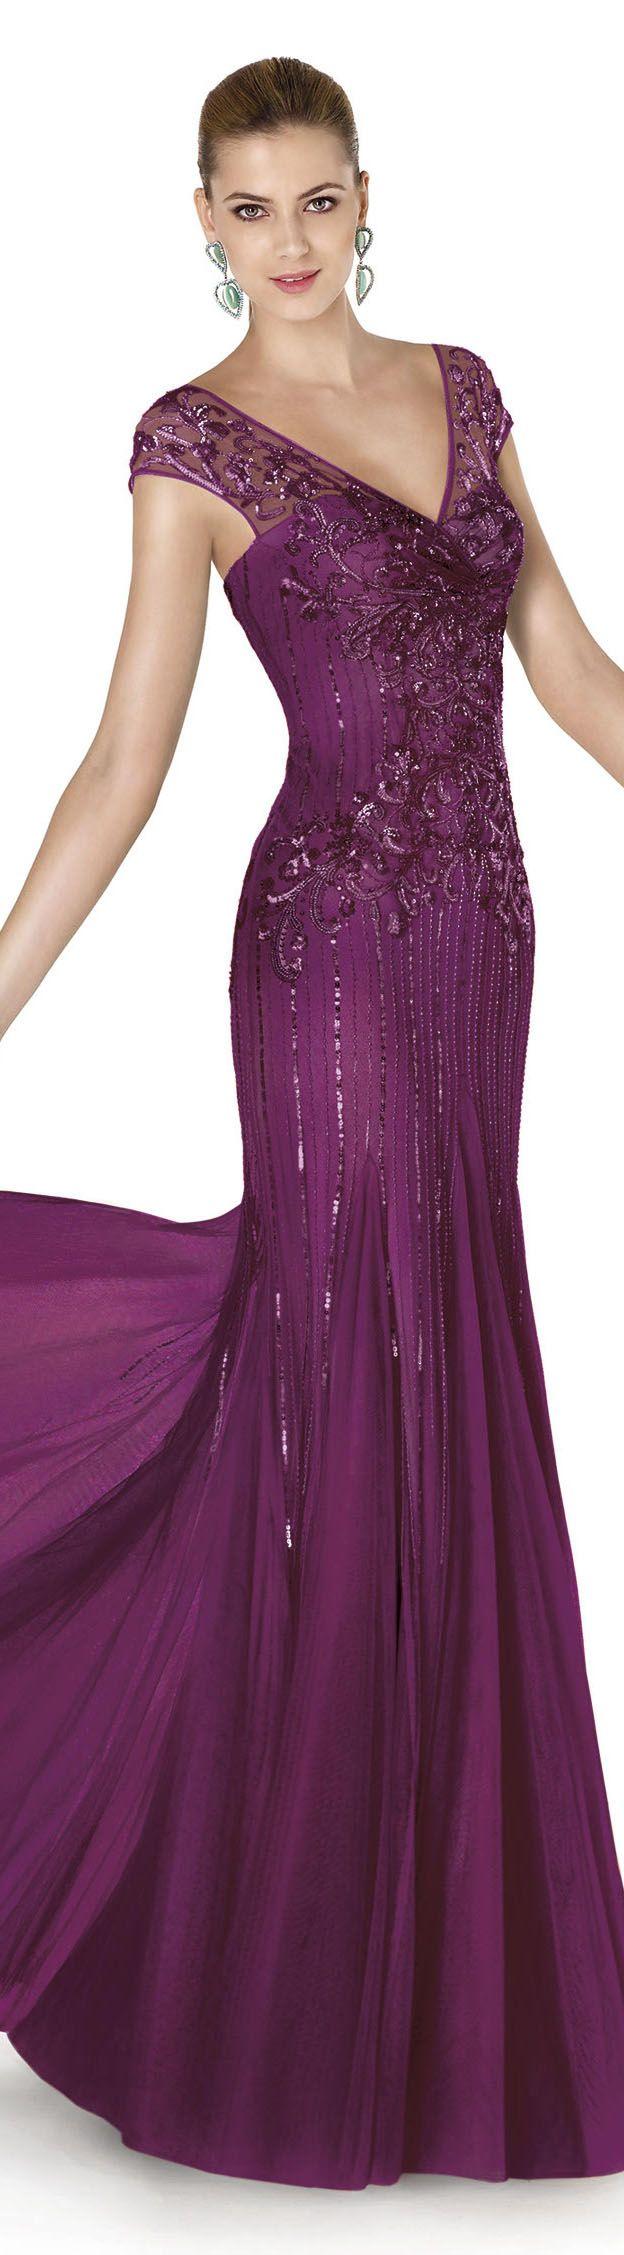 Pronovias 2015 Cocktail Dress Collection (ABADESA)